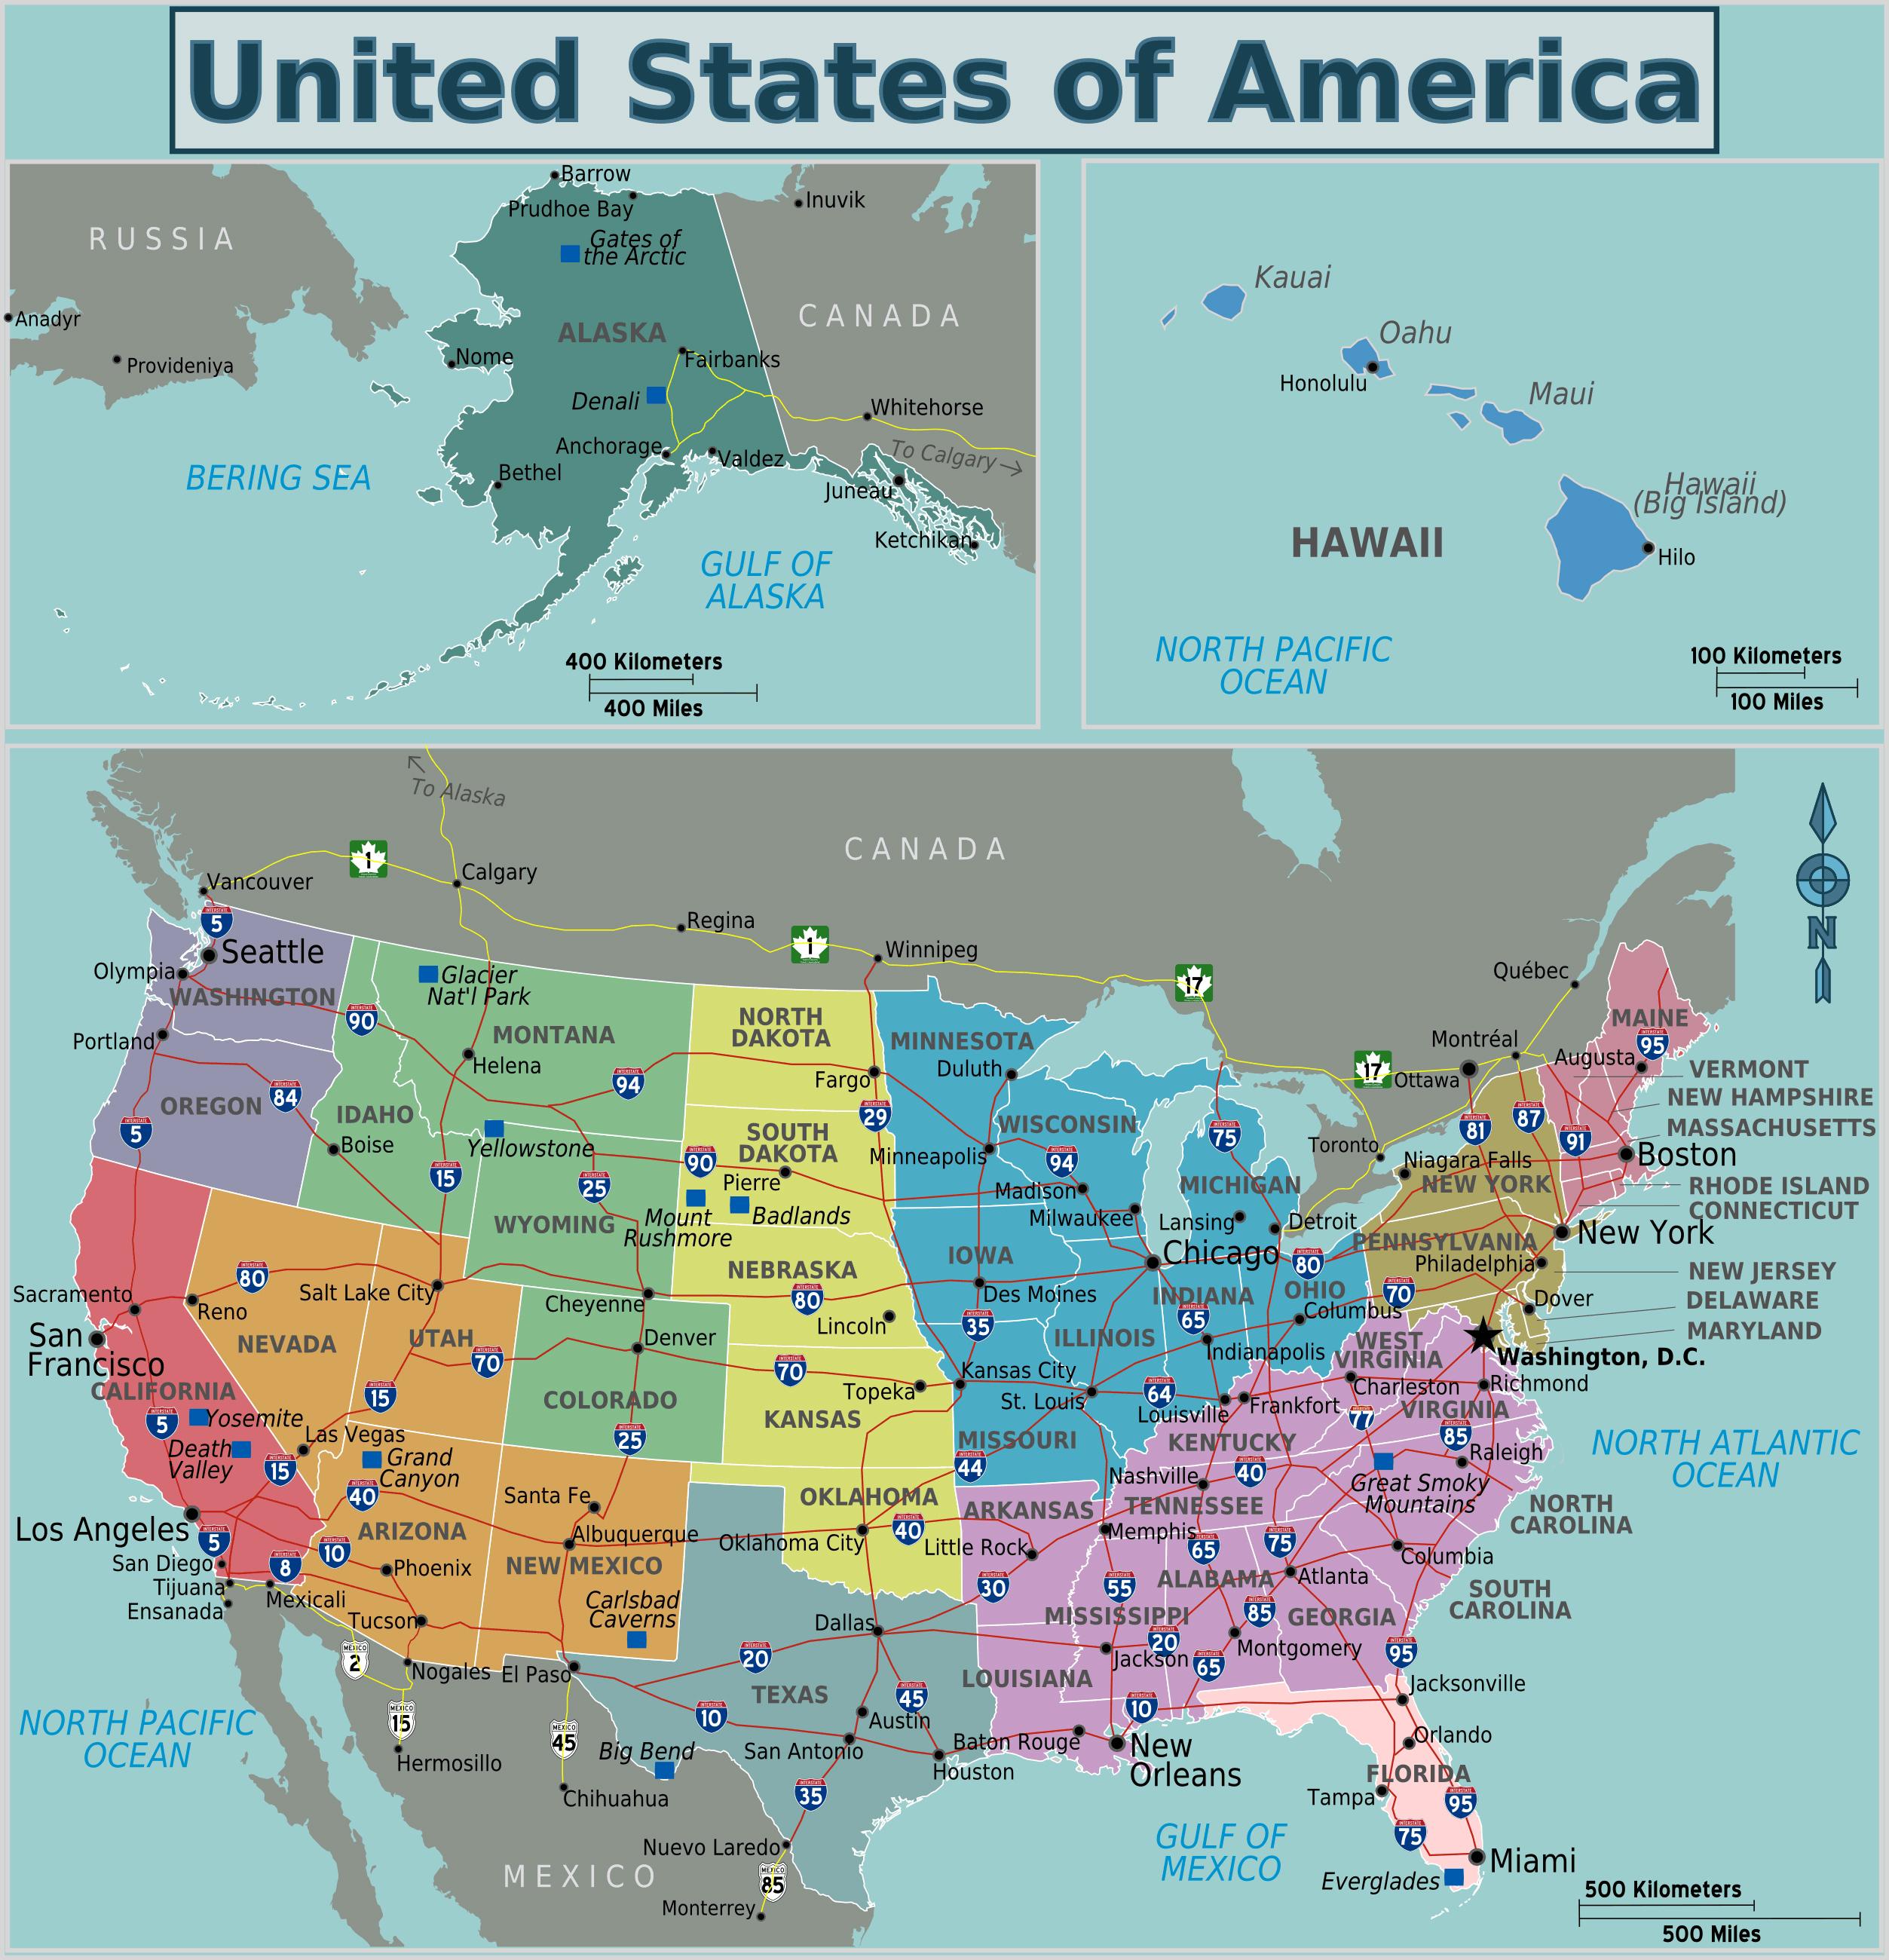 Large regions map of the USA | USA | Maps of the USA | Maps ... on usa map bahamas, usa map california, usa map northeastern united states, usa map new york, usa map north america, usa map san diego, usa map gulf of mexico, usa map mississippi river, usa map seattle, usa map mojave desert, usa map pacific ocean, usa map atlantic ocean, usa map great lakes, usa map guam, usa map san francisco, usa map puget sound, usa map aleutian islands, usa map alaska, usa map canada, usa map chesapeake bay,